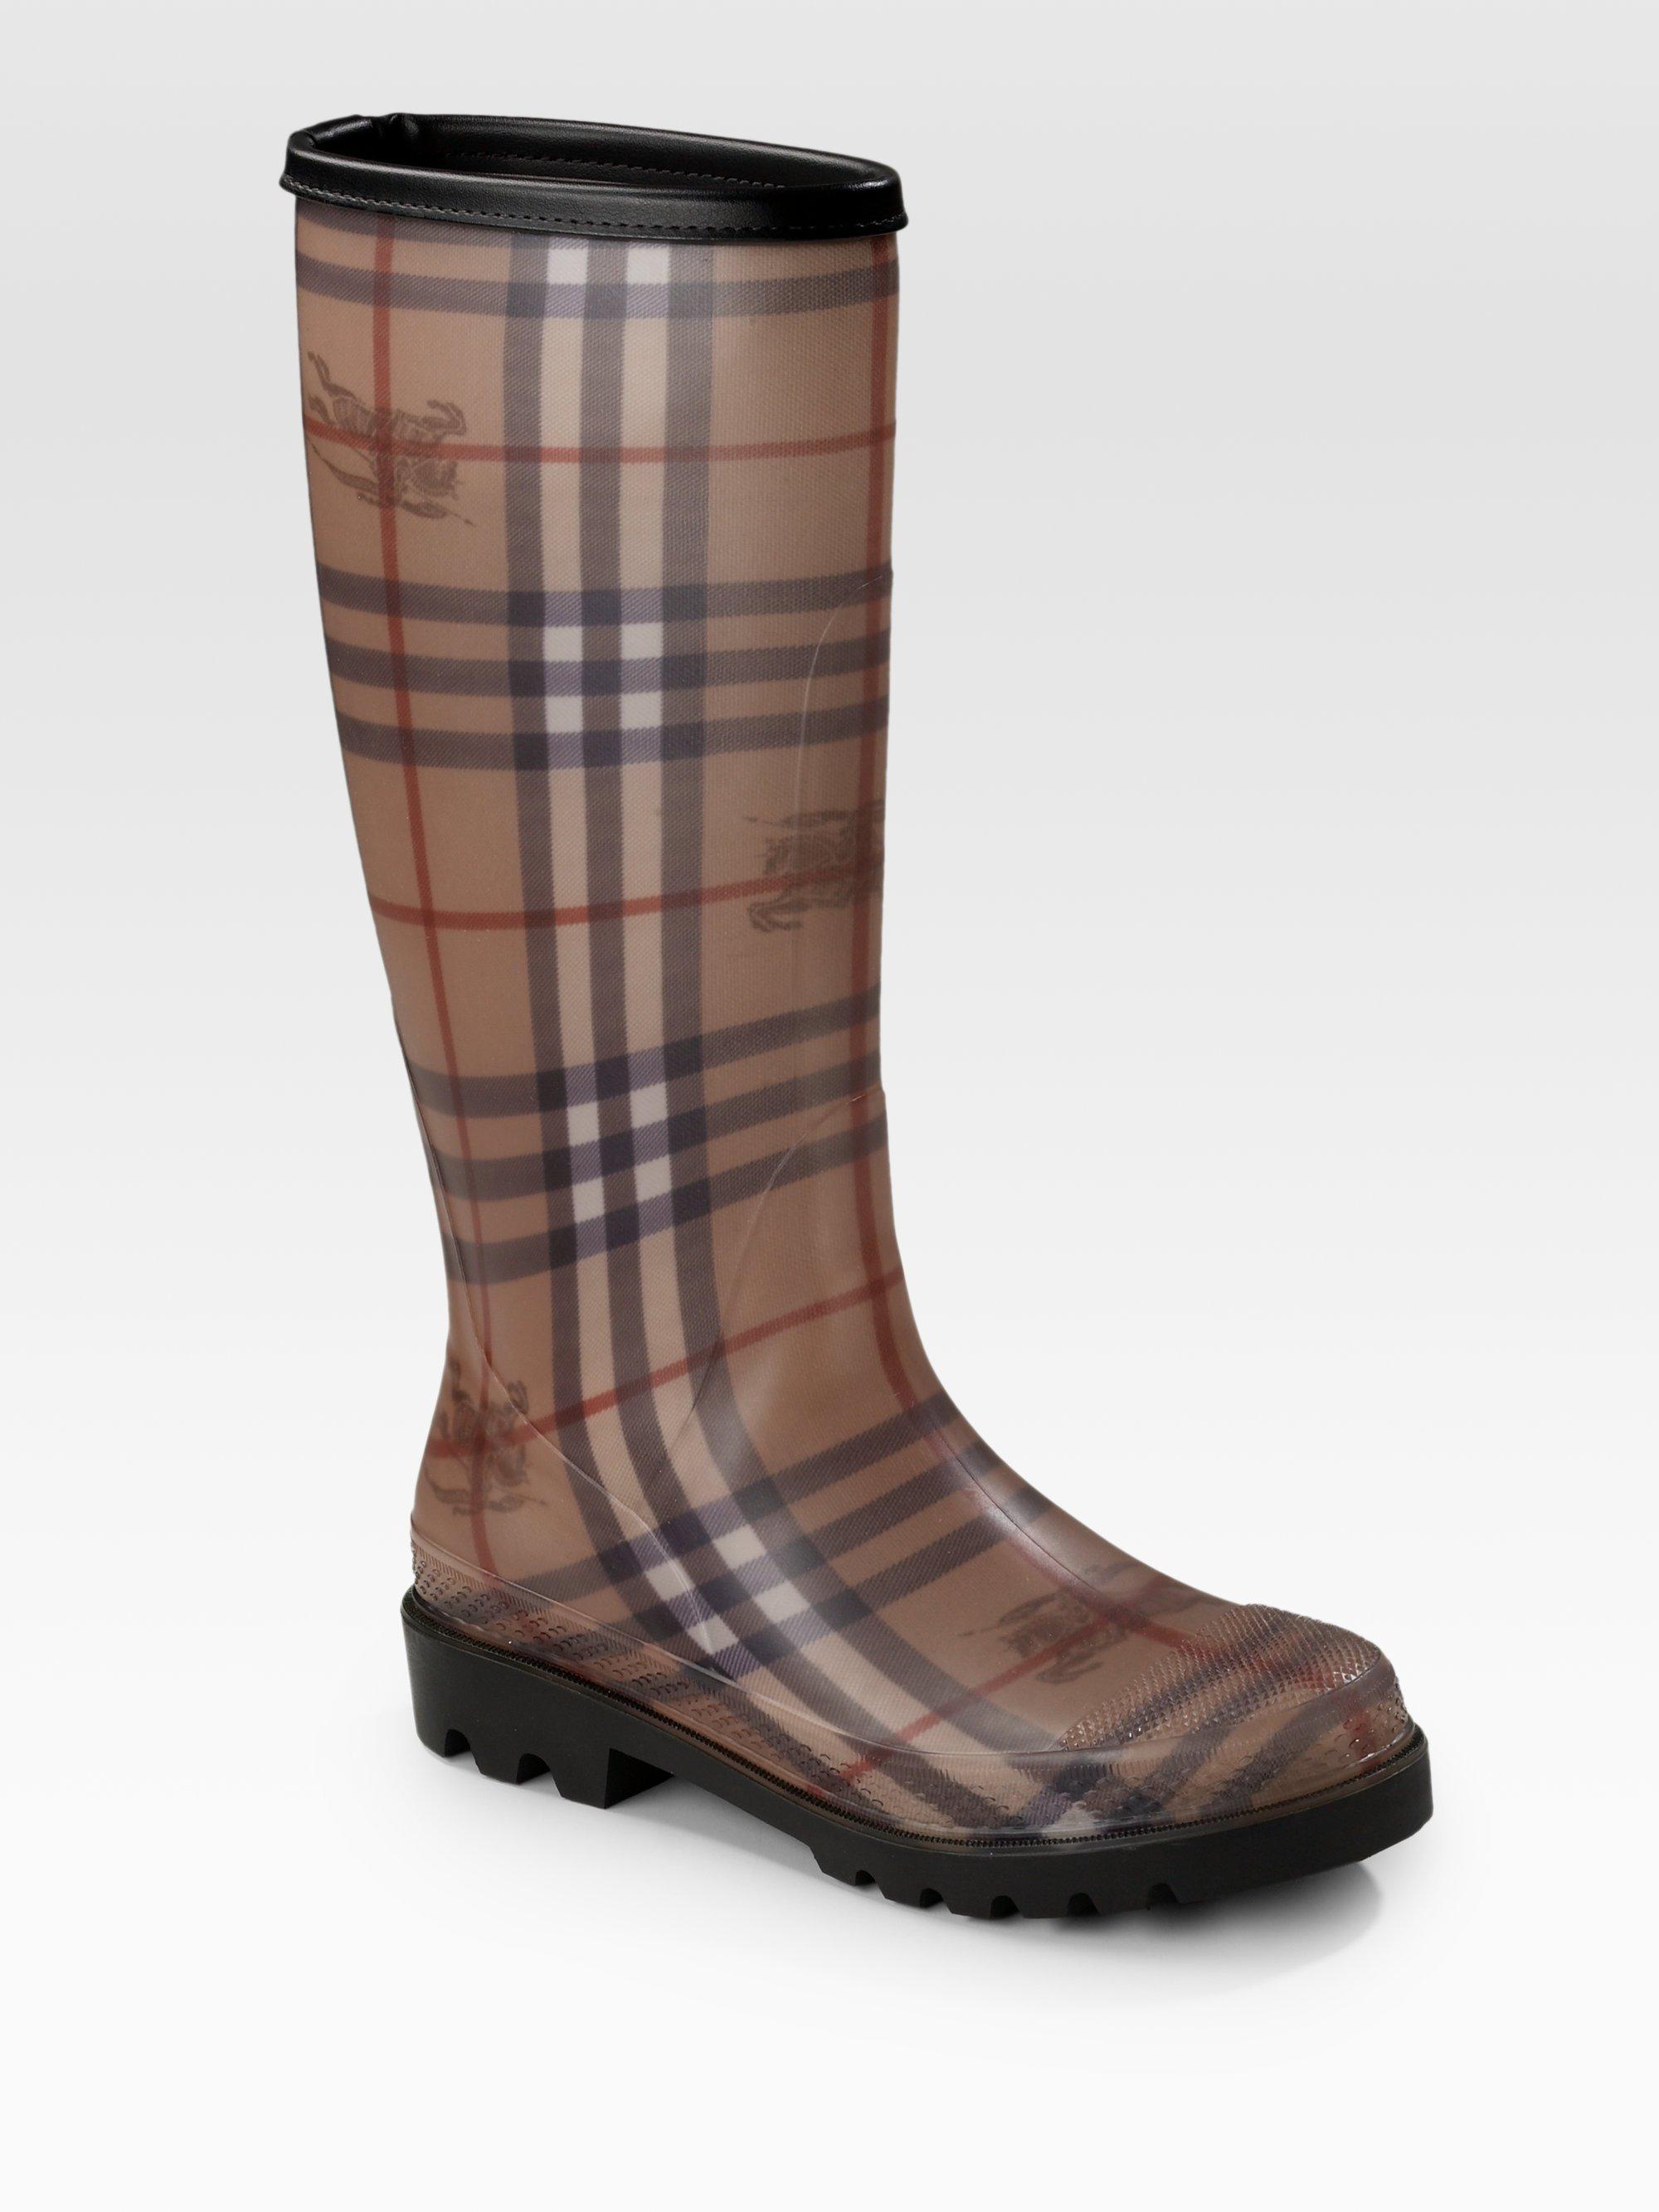 Burberry & Check Biker Rain Boots hADRlYiGt3